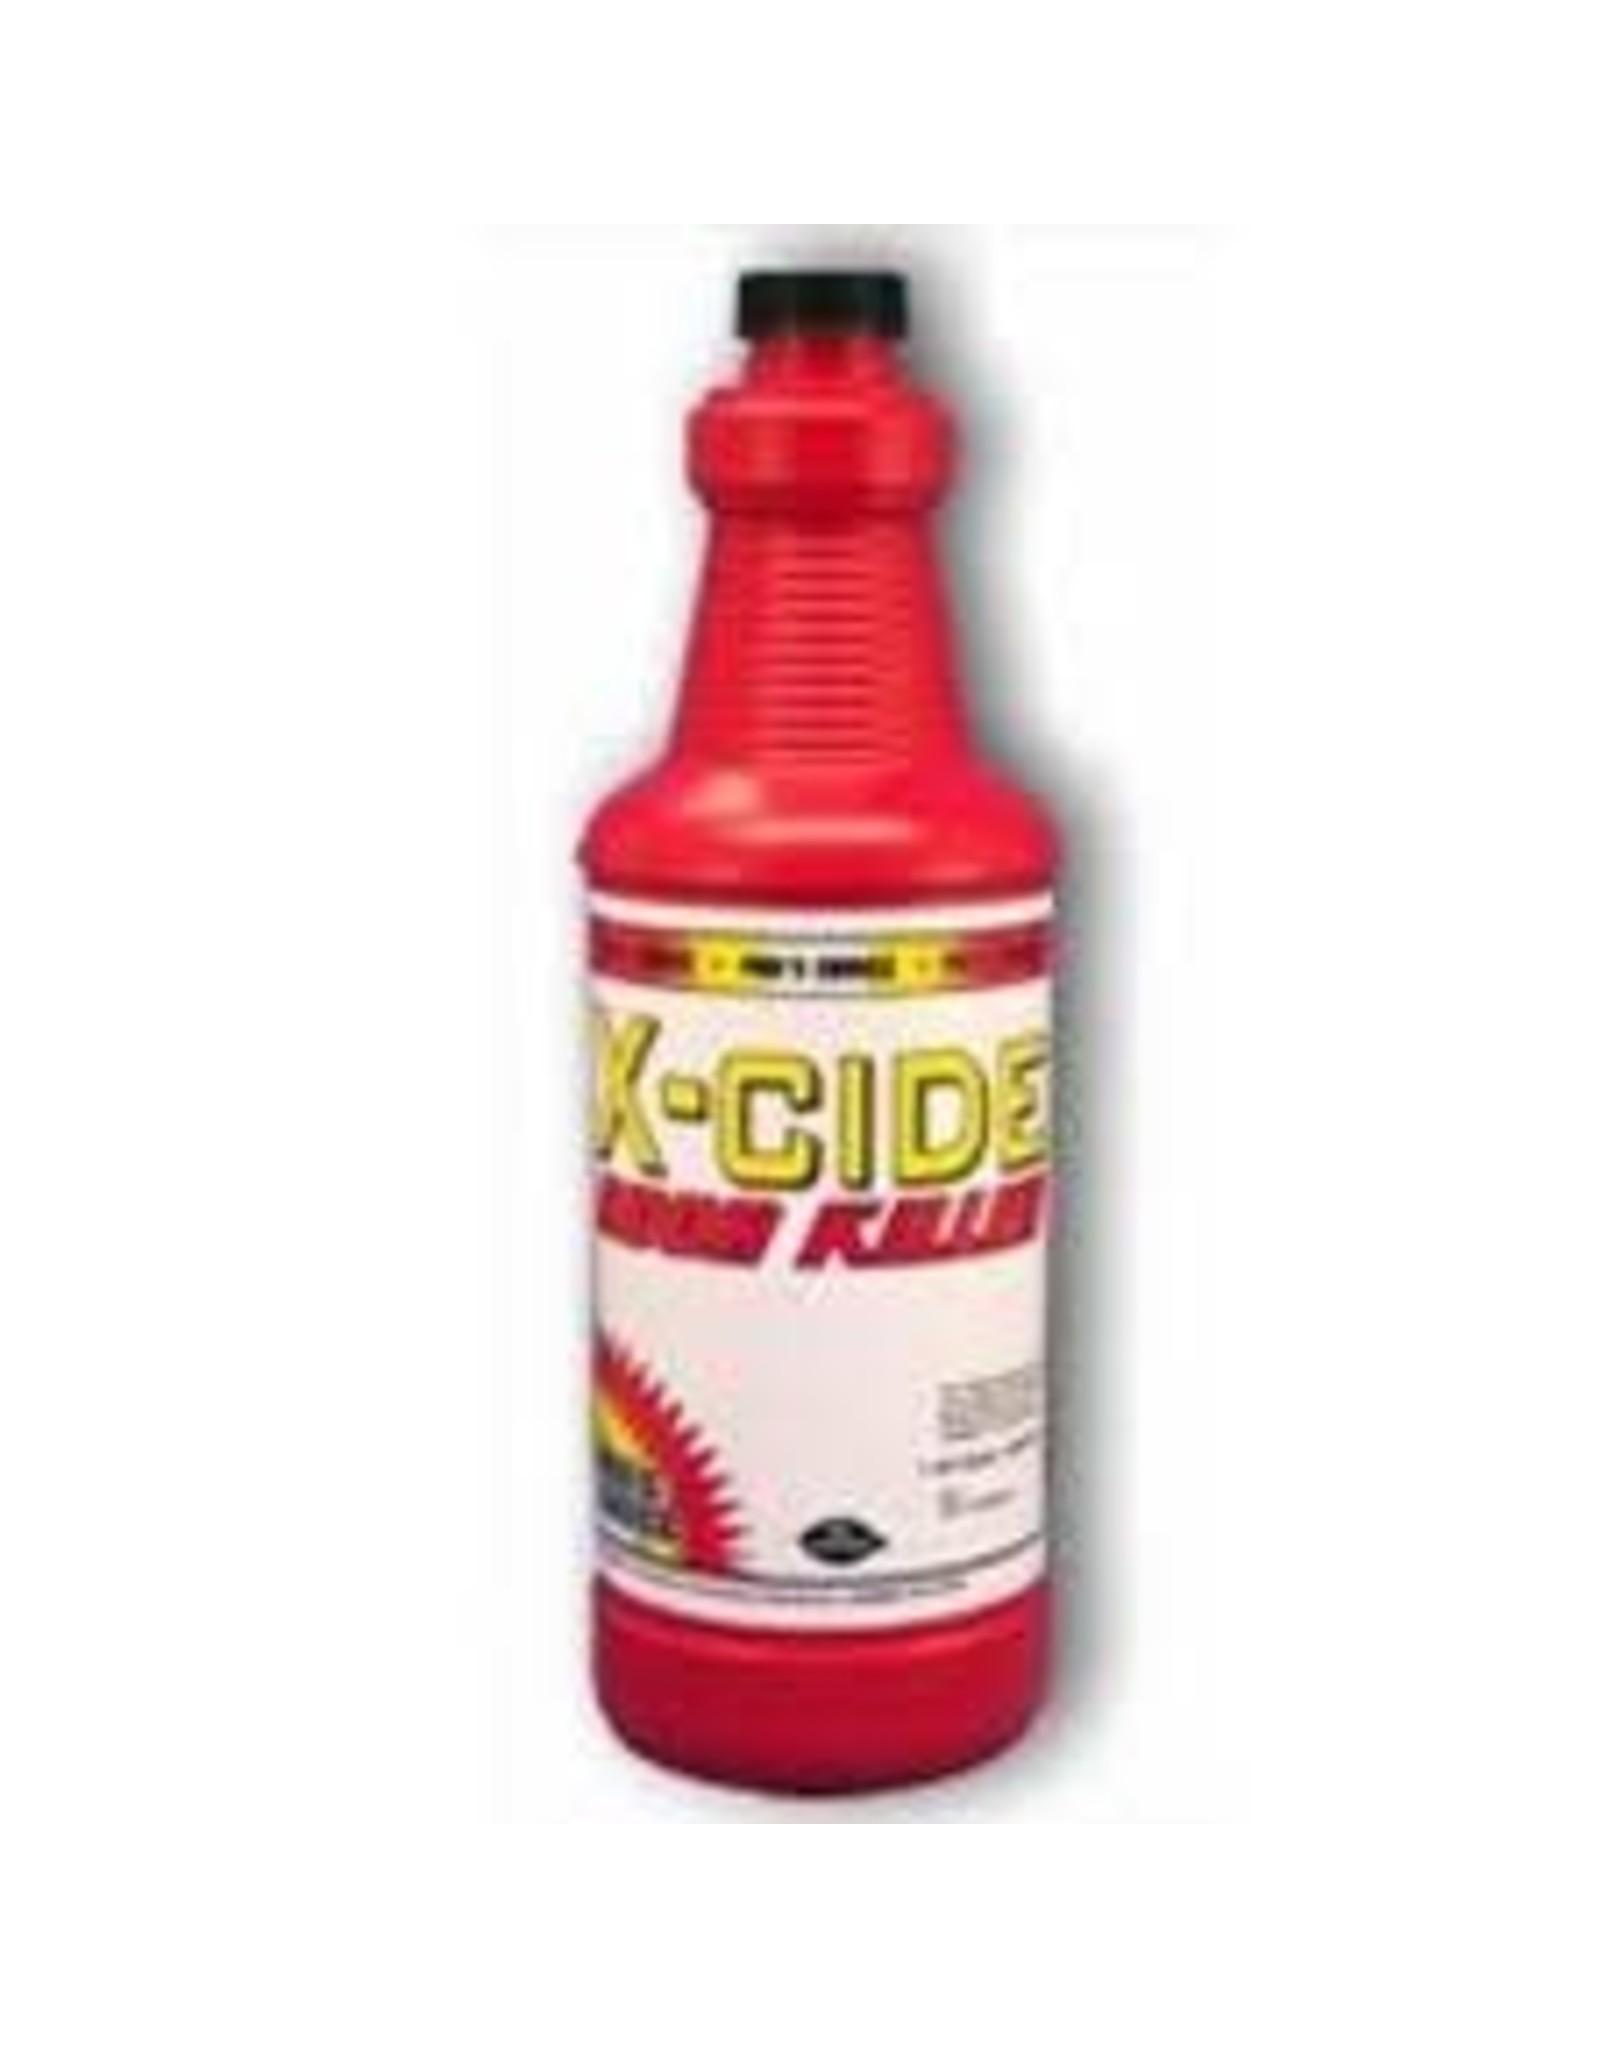 Pro's Choice X-Cide Odor Killer